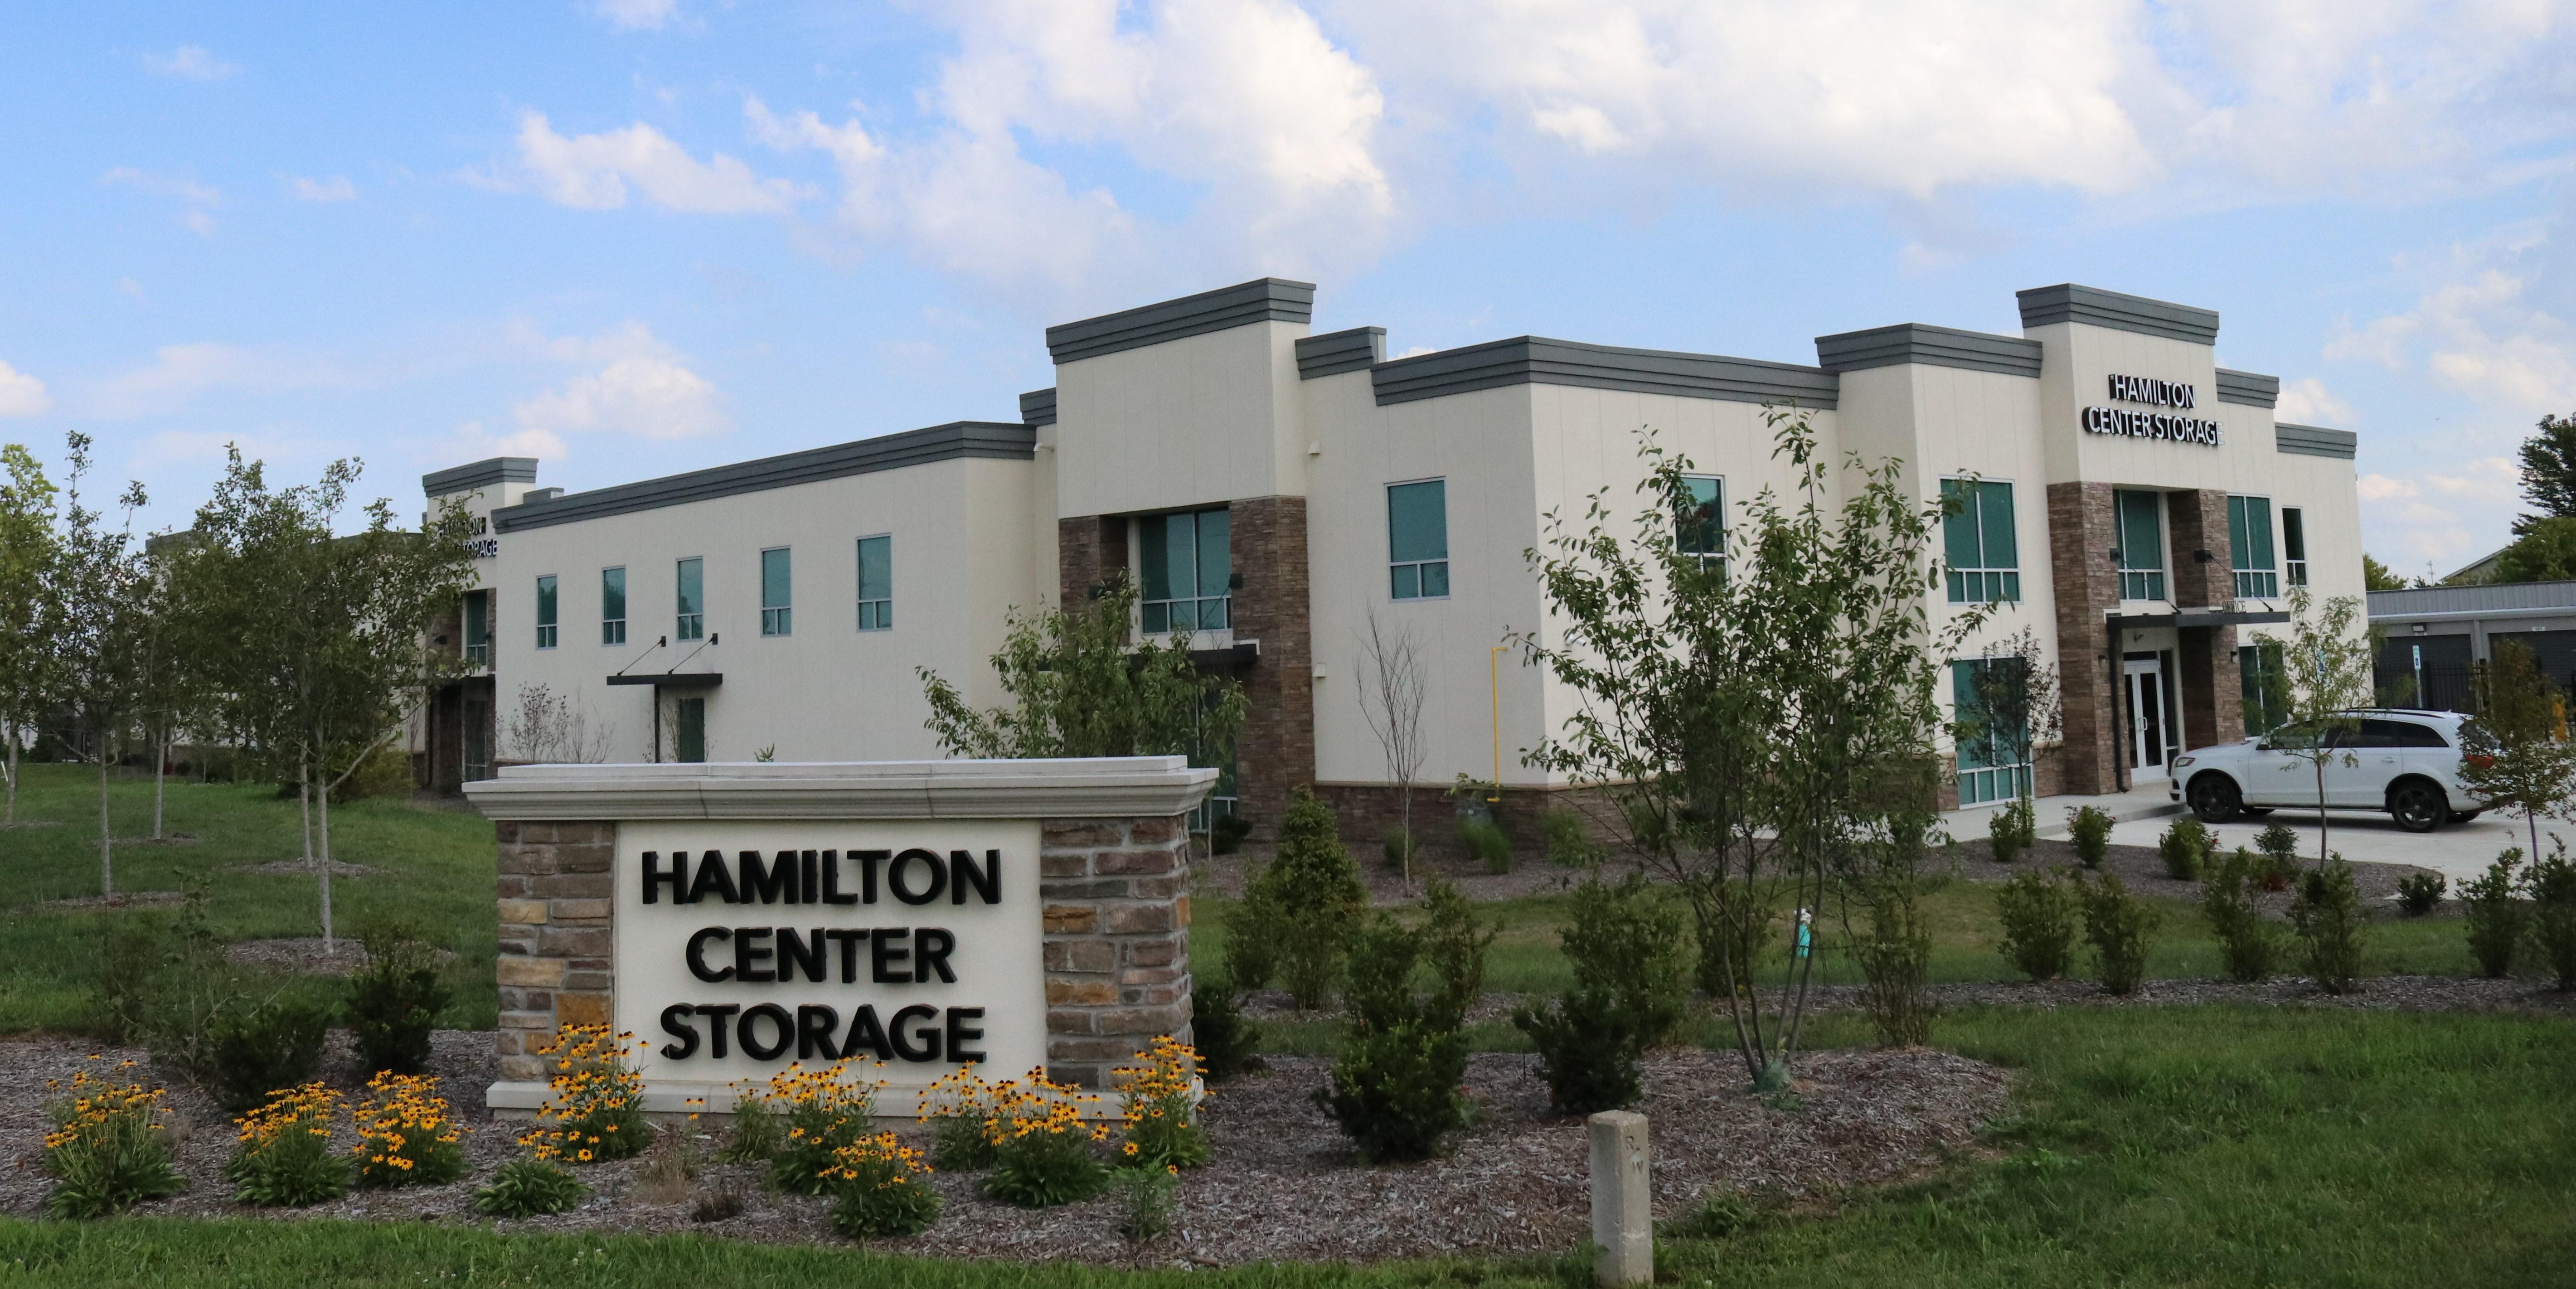 Storage Units in Noblesville, IN